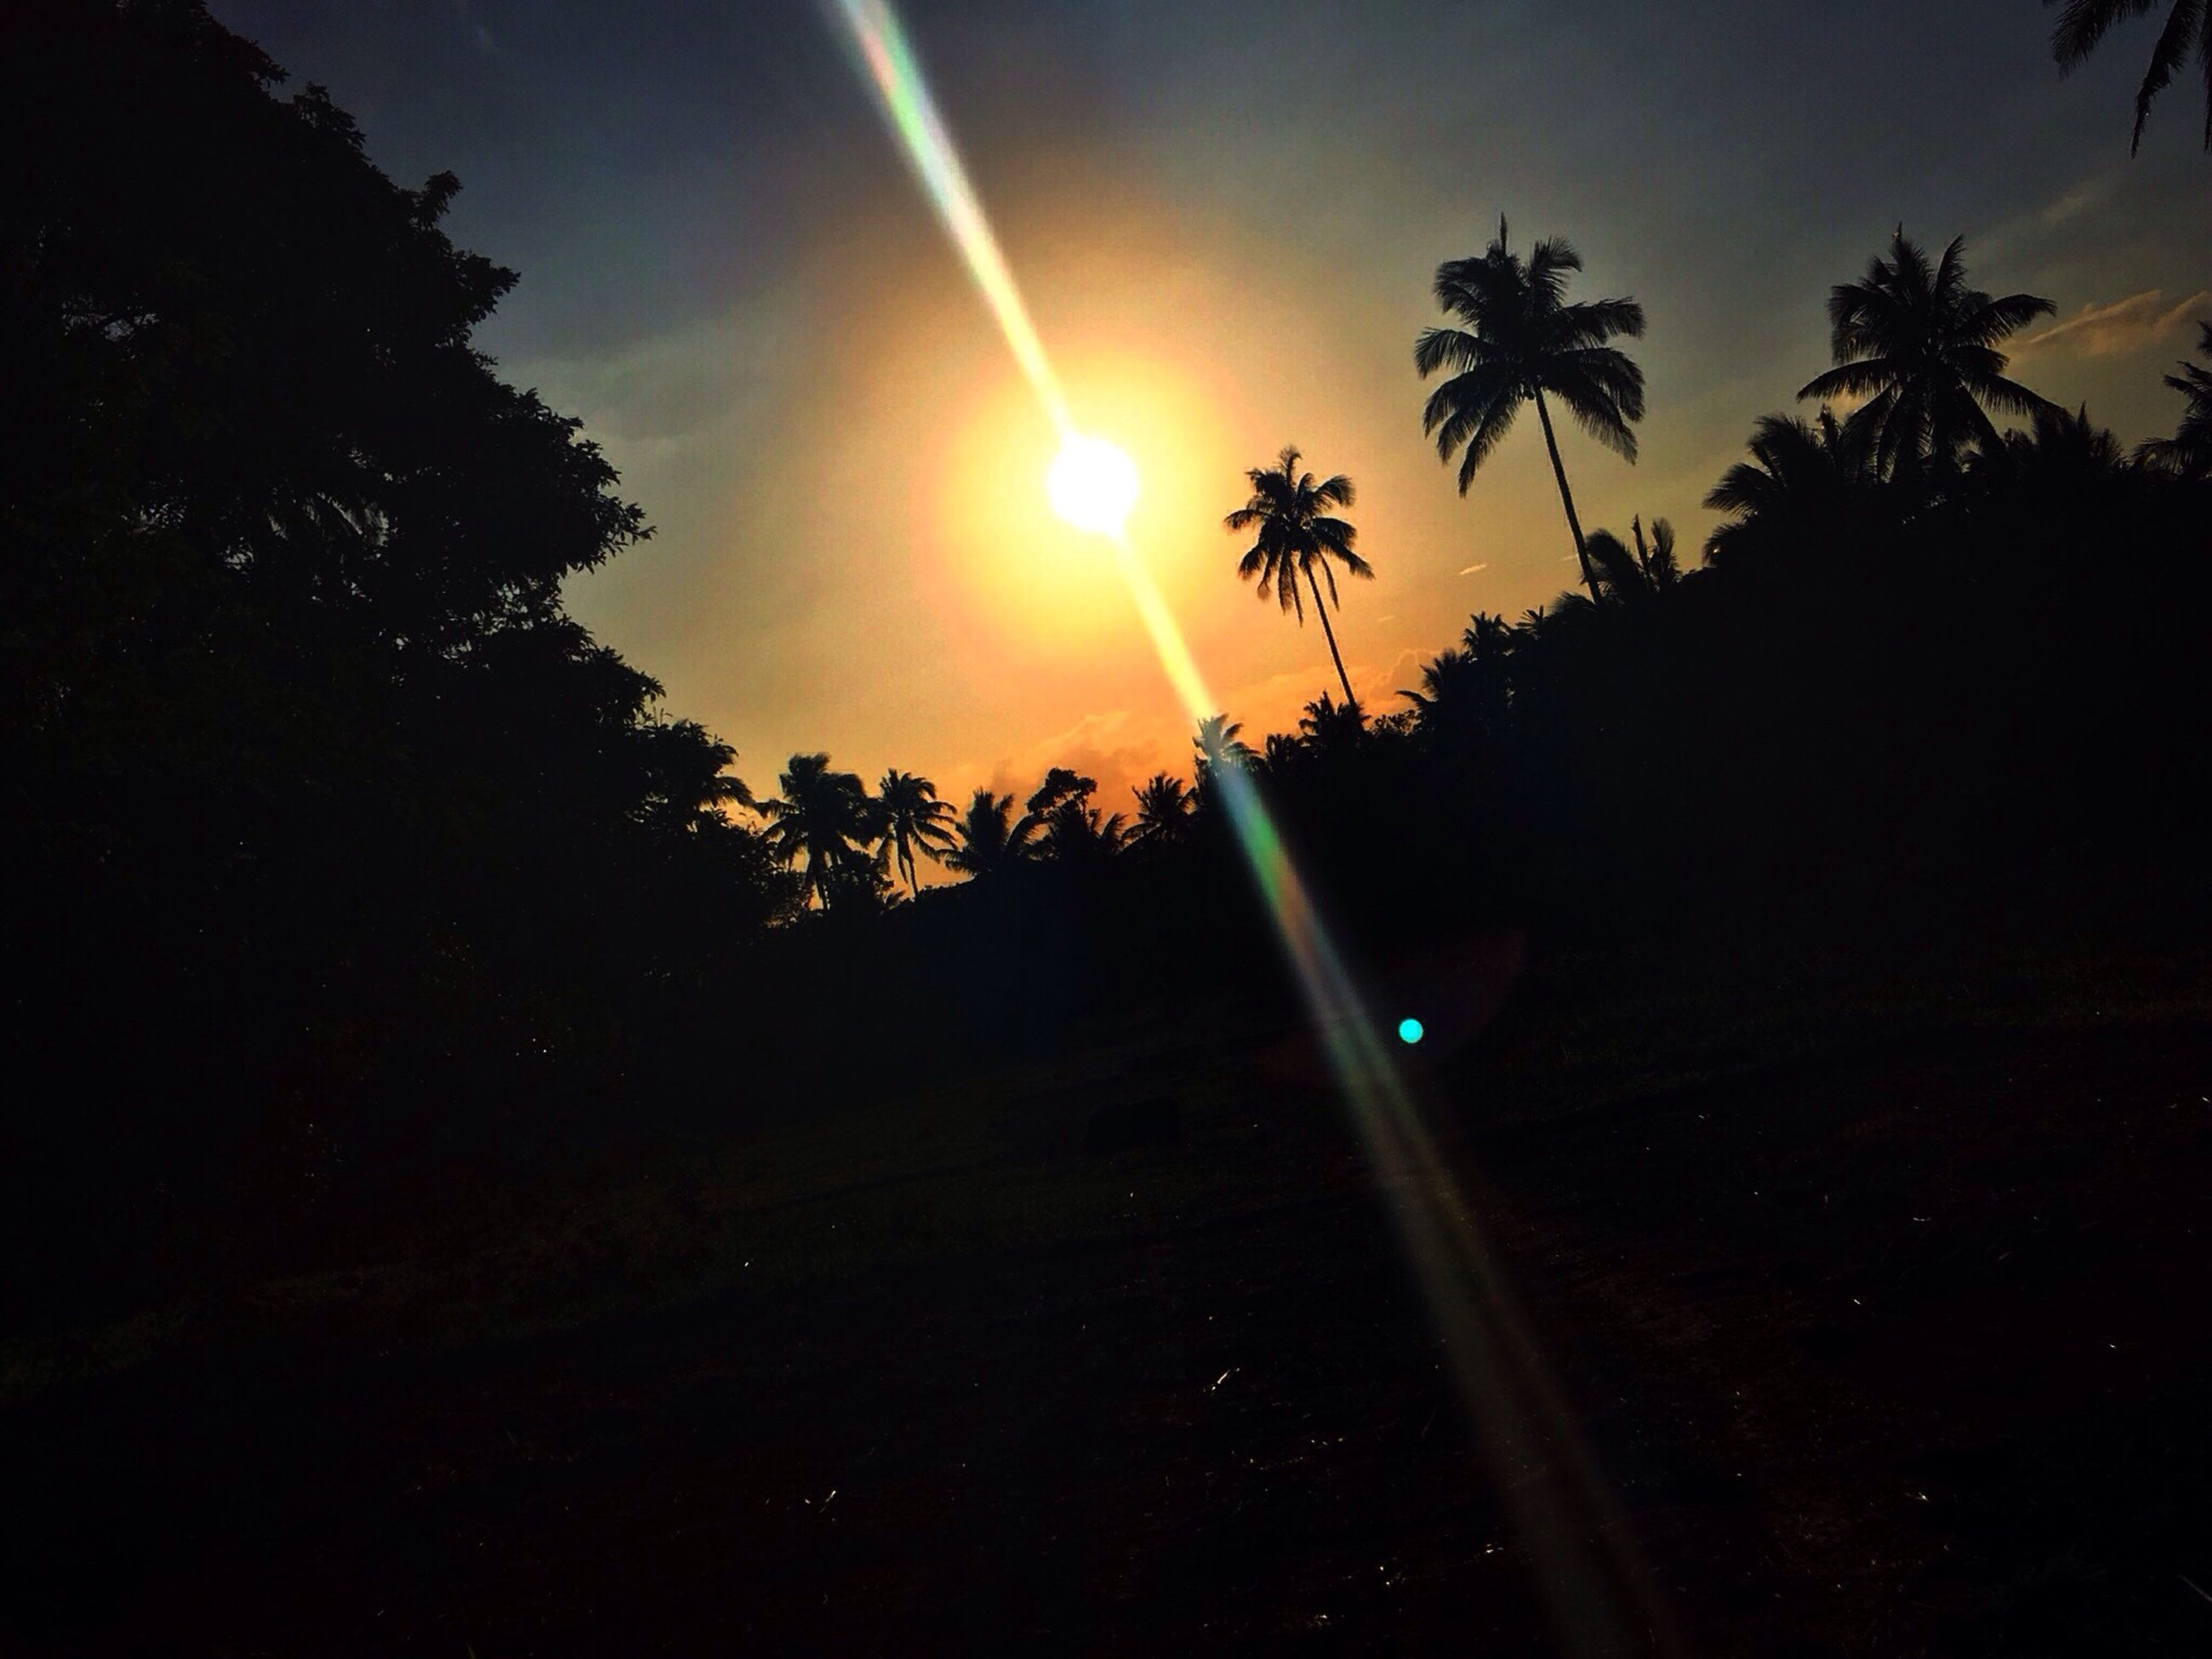 sunset, tree, silhouette, sun, sky, tranquil scene, tranquility, scenics, beauty in nature, nature, sunlight, idyllic, landscape, palm tree, orange color, cloud - sky, lens flare, sunbeam, growth, outdoors